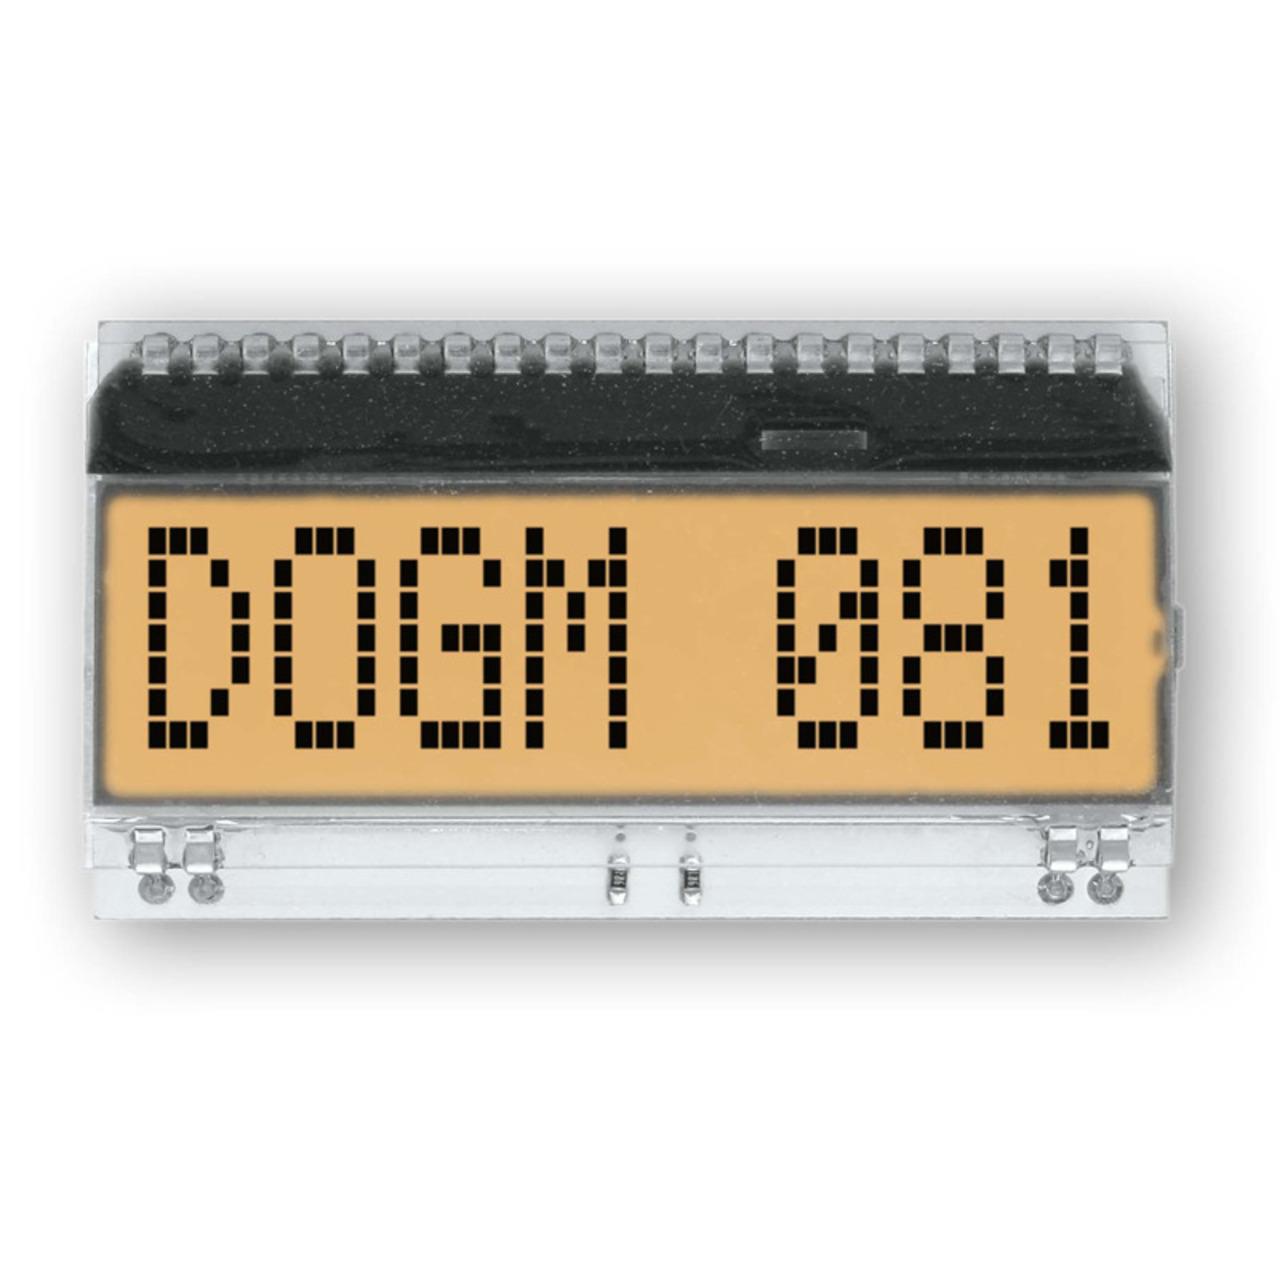 Electronic Assembly LCD-Punktmatrixdisplay EA DOGM081W-A 11-97 mm 1x8